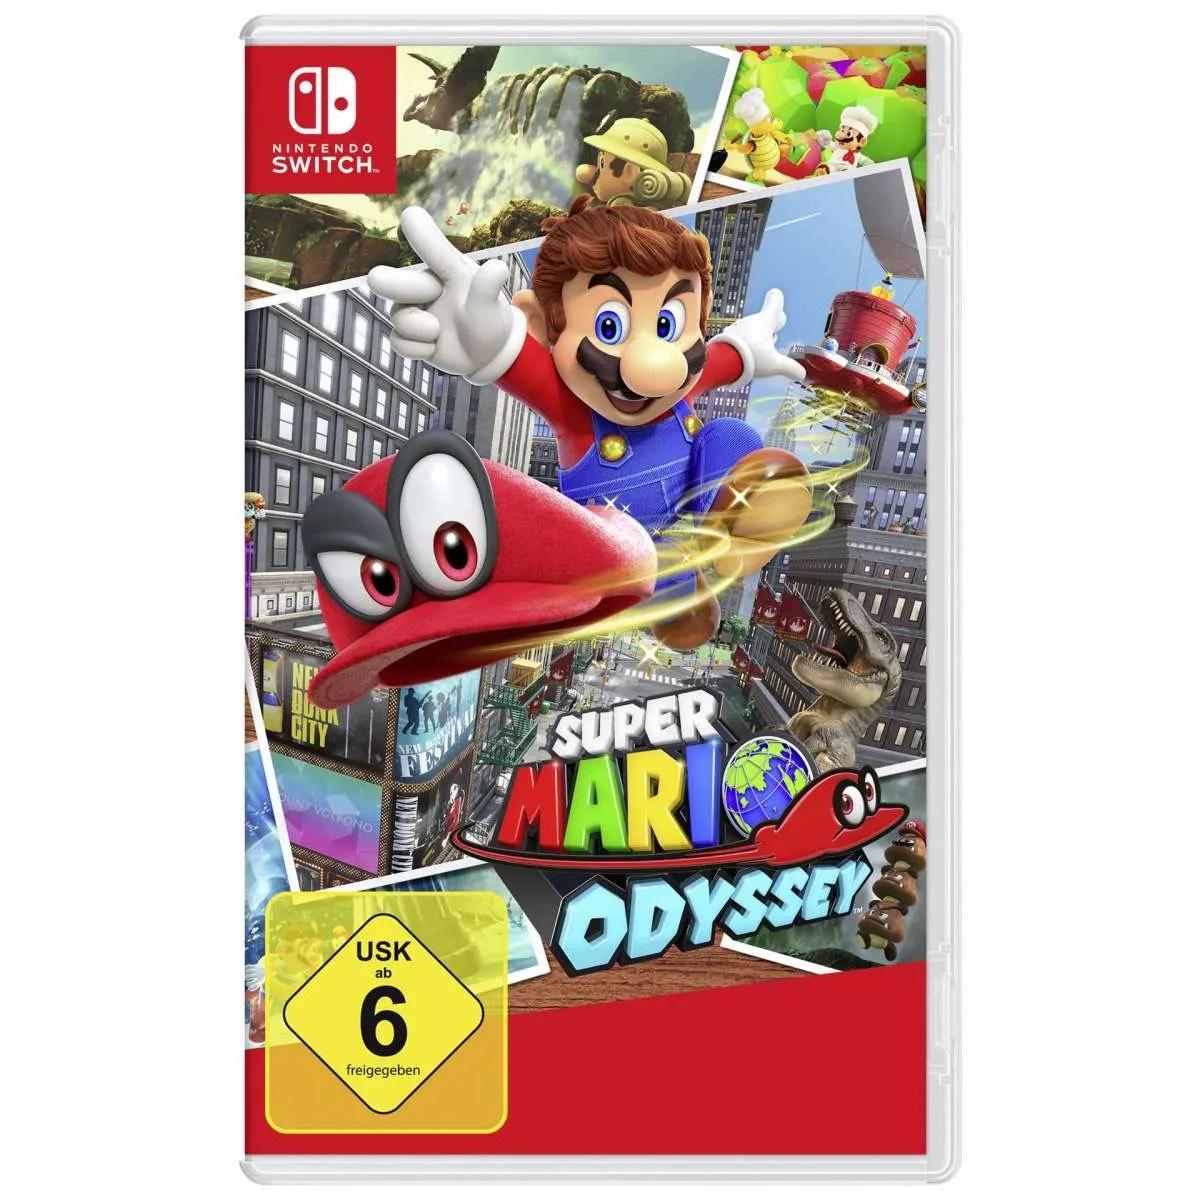 [Maingau Kunden] Nintendo Switch Super Mario Odyssey